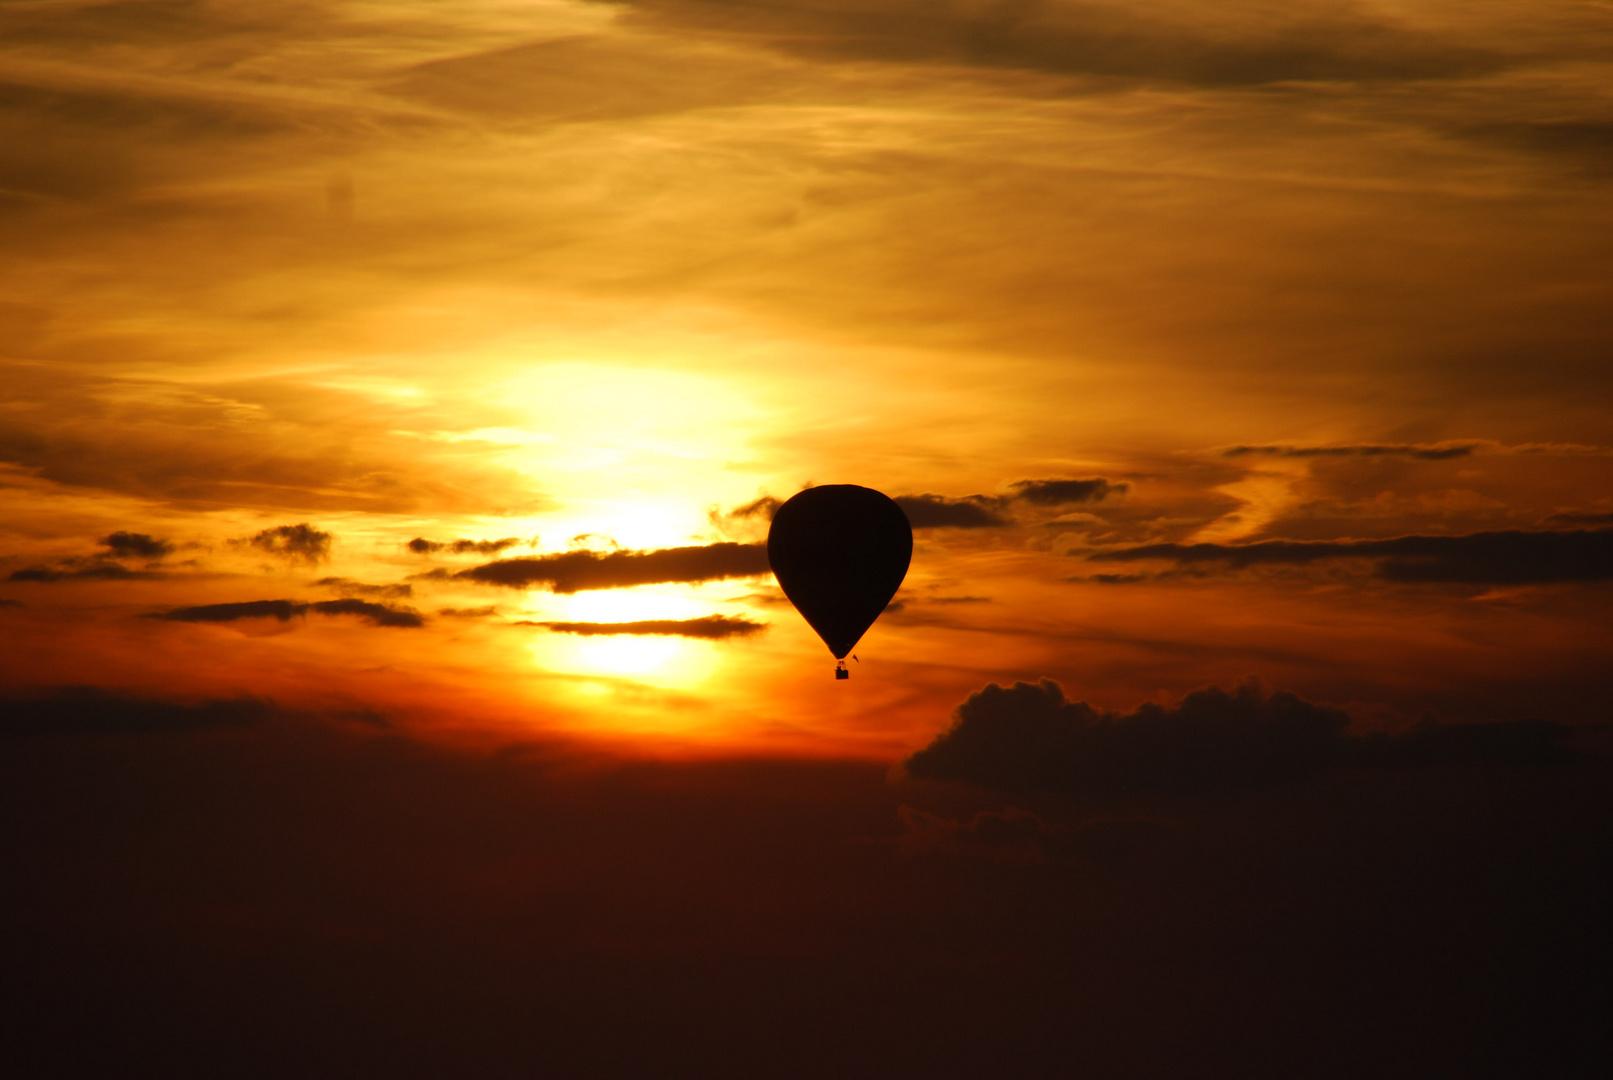 Sonnenuntergang im Ballon